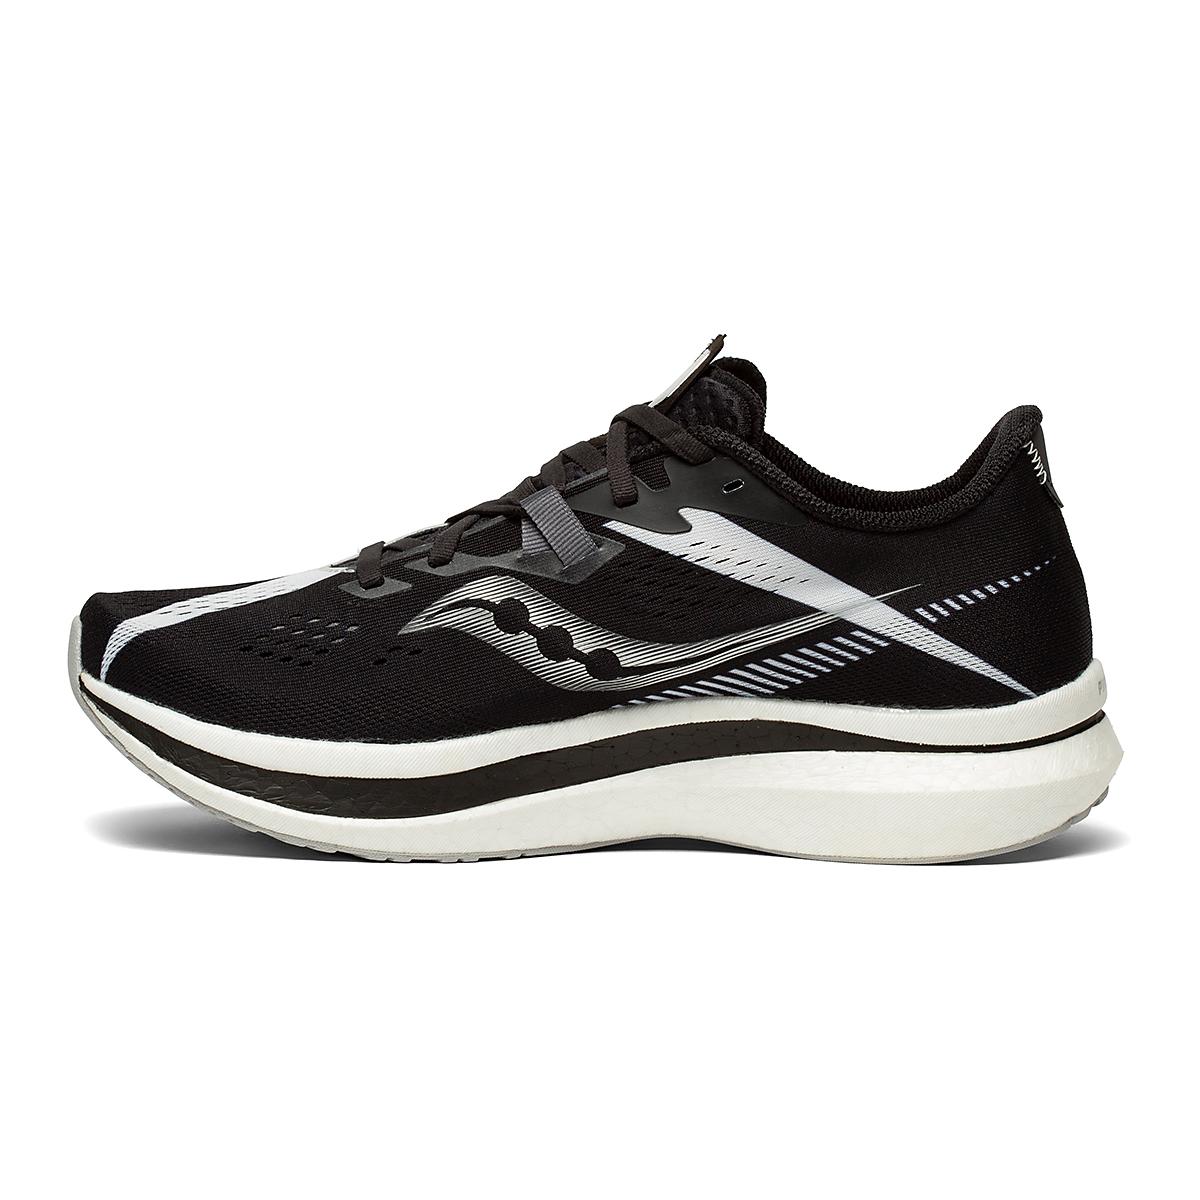 Men's Saucony Endorphin Pro 2 Running Shoe - Color: Black/White - Size: 7 - Width: Regular, Black/White, large, image 2